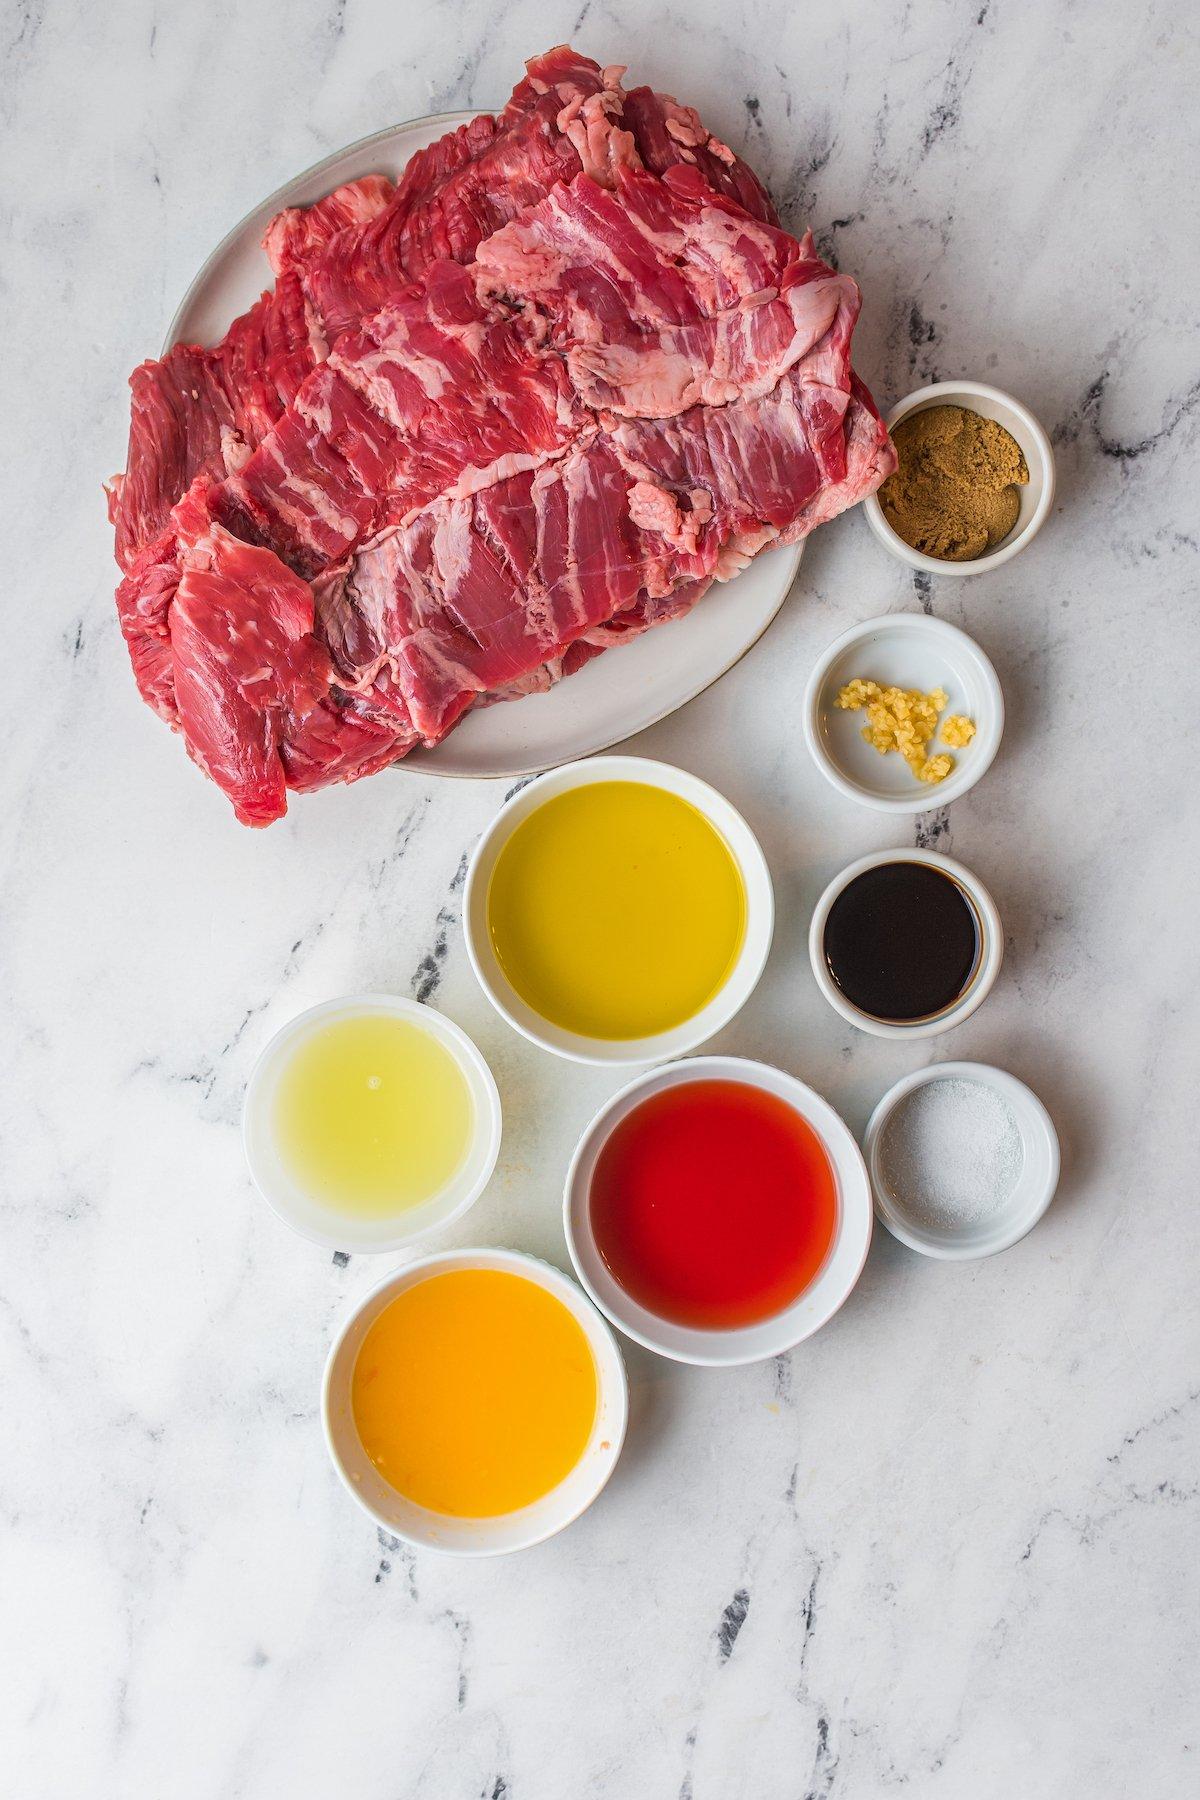 Ingredients for flank steak.